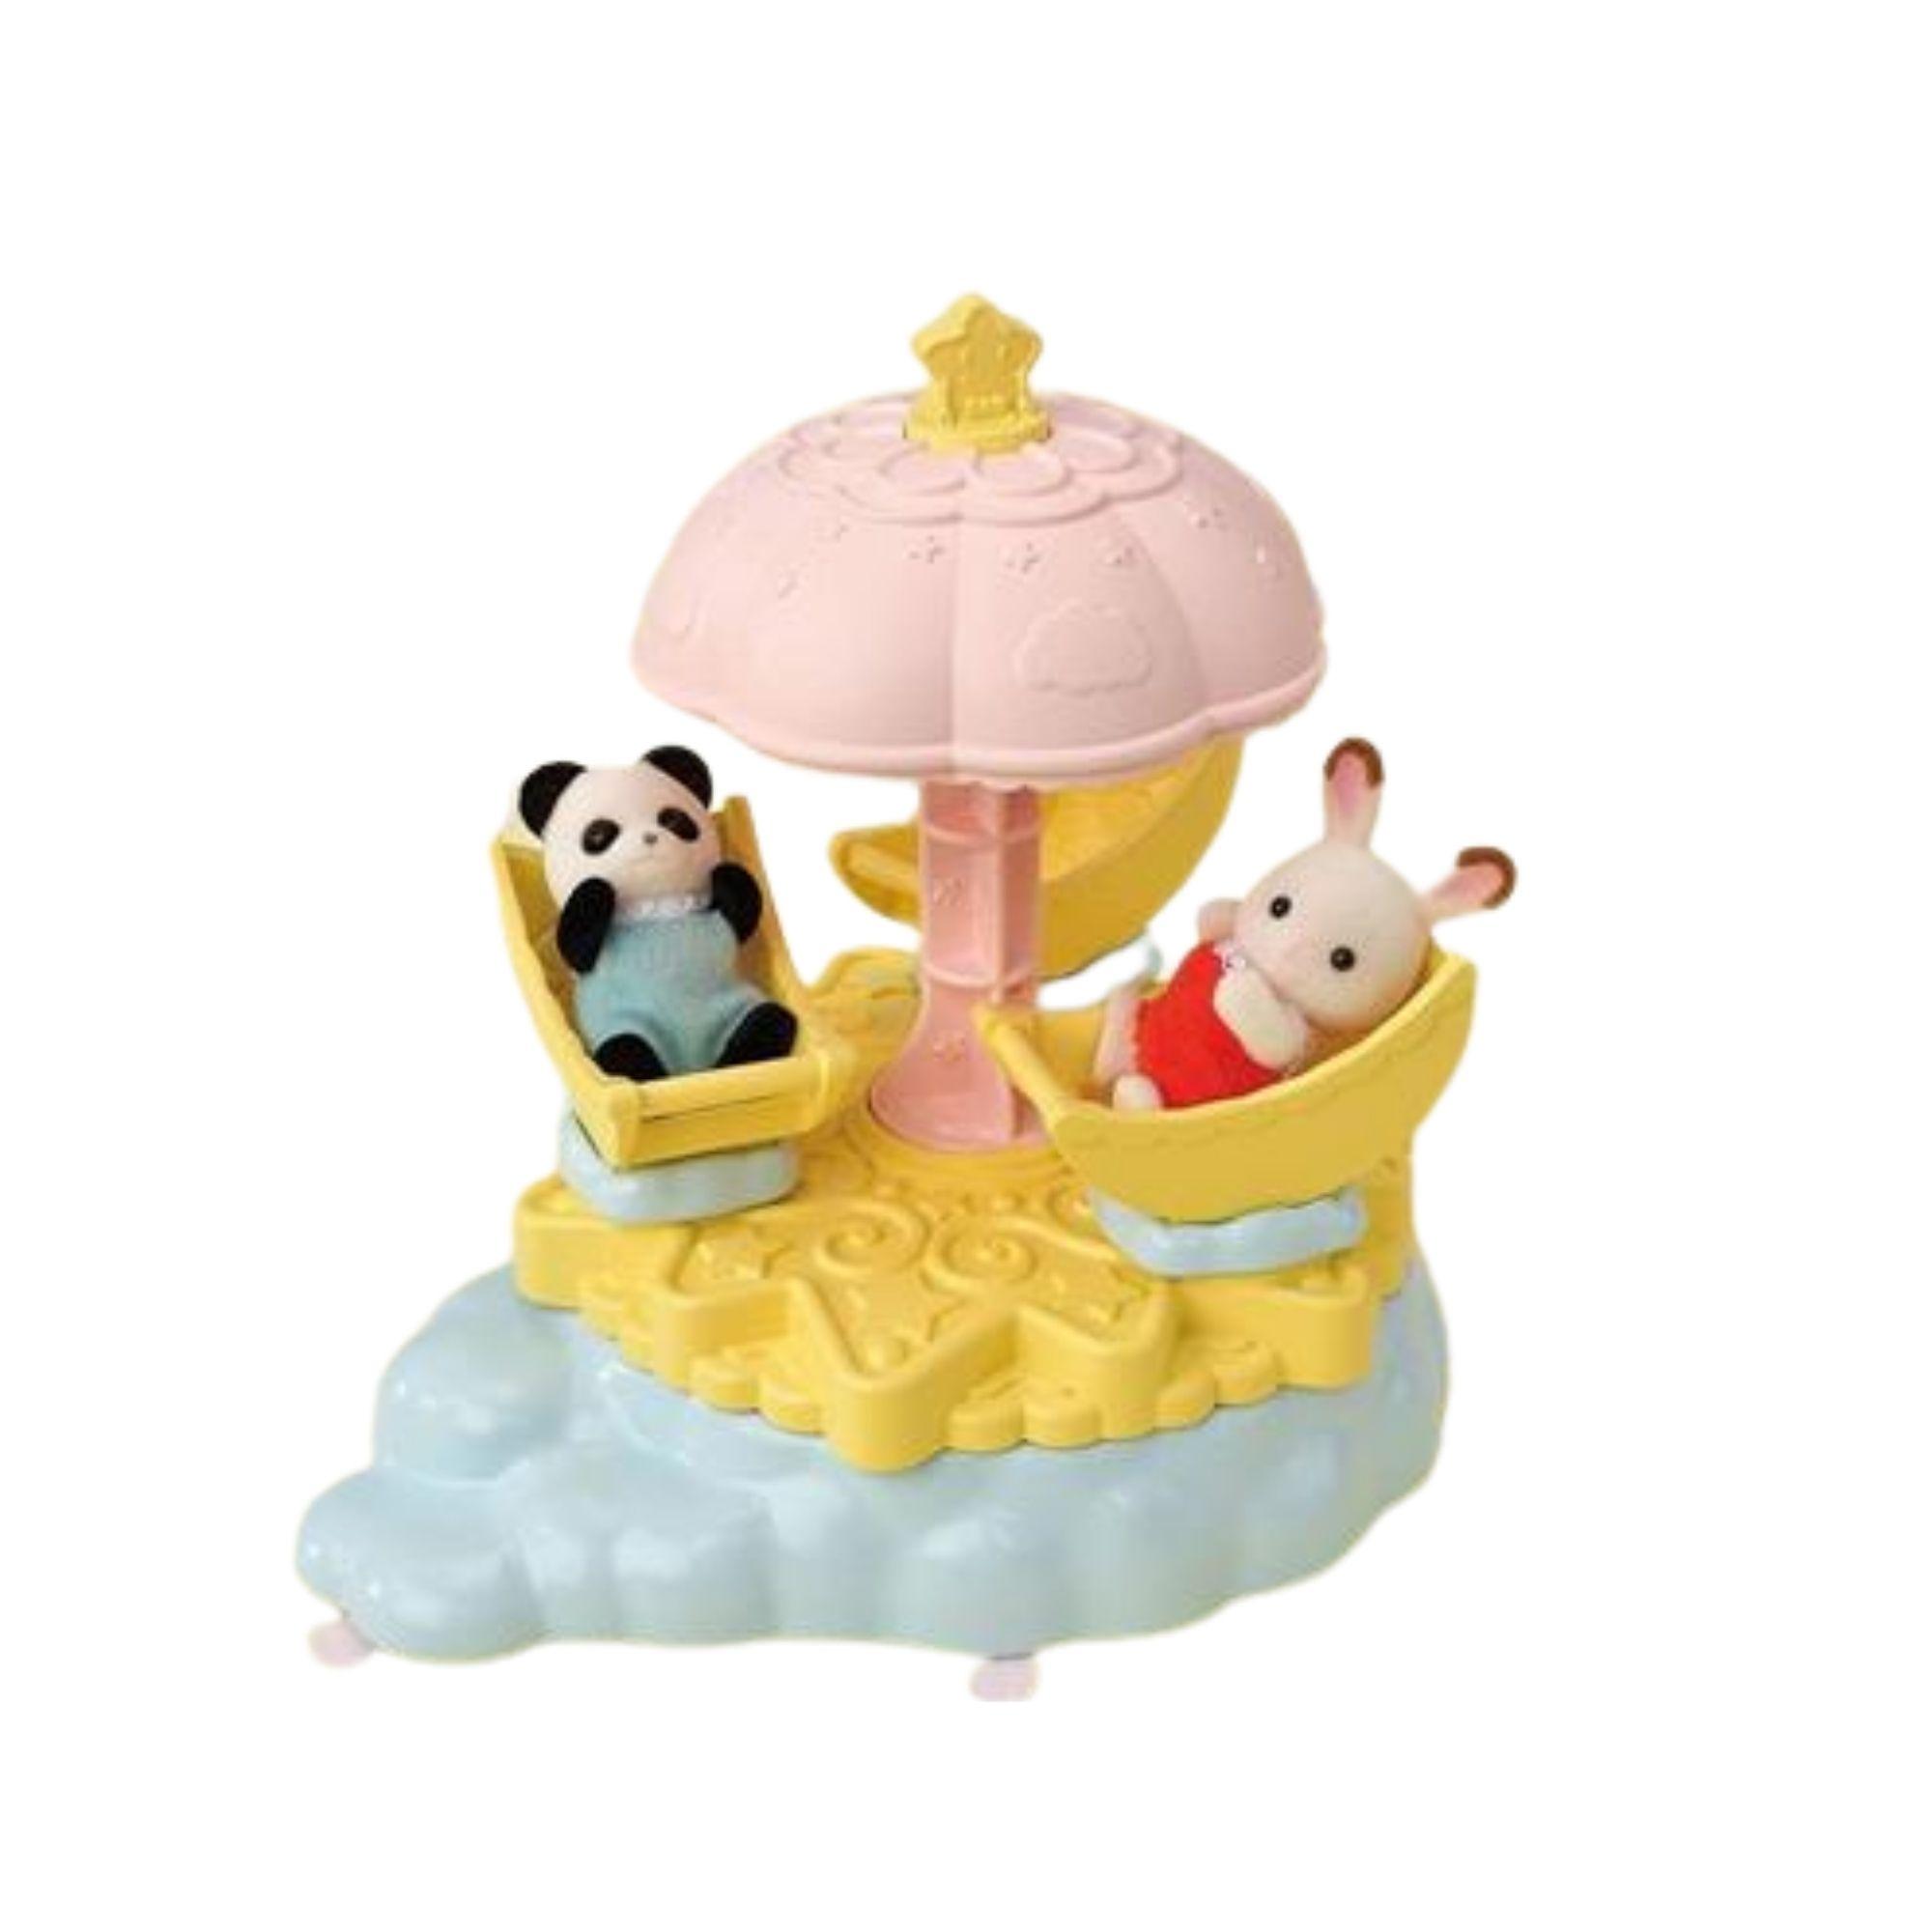 Brinquedo Sylvanian Families Carrossel Estrela Para Bebês Epoch 5539  - Game Land Brinquedos